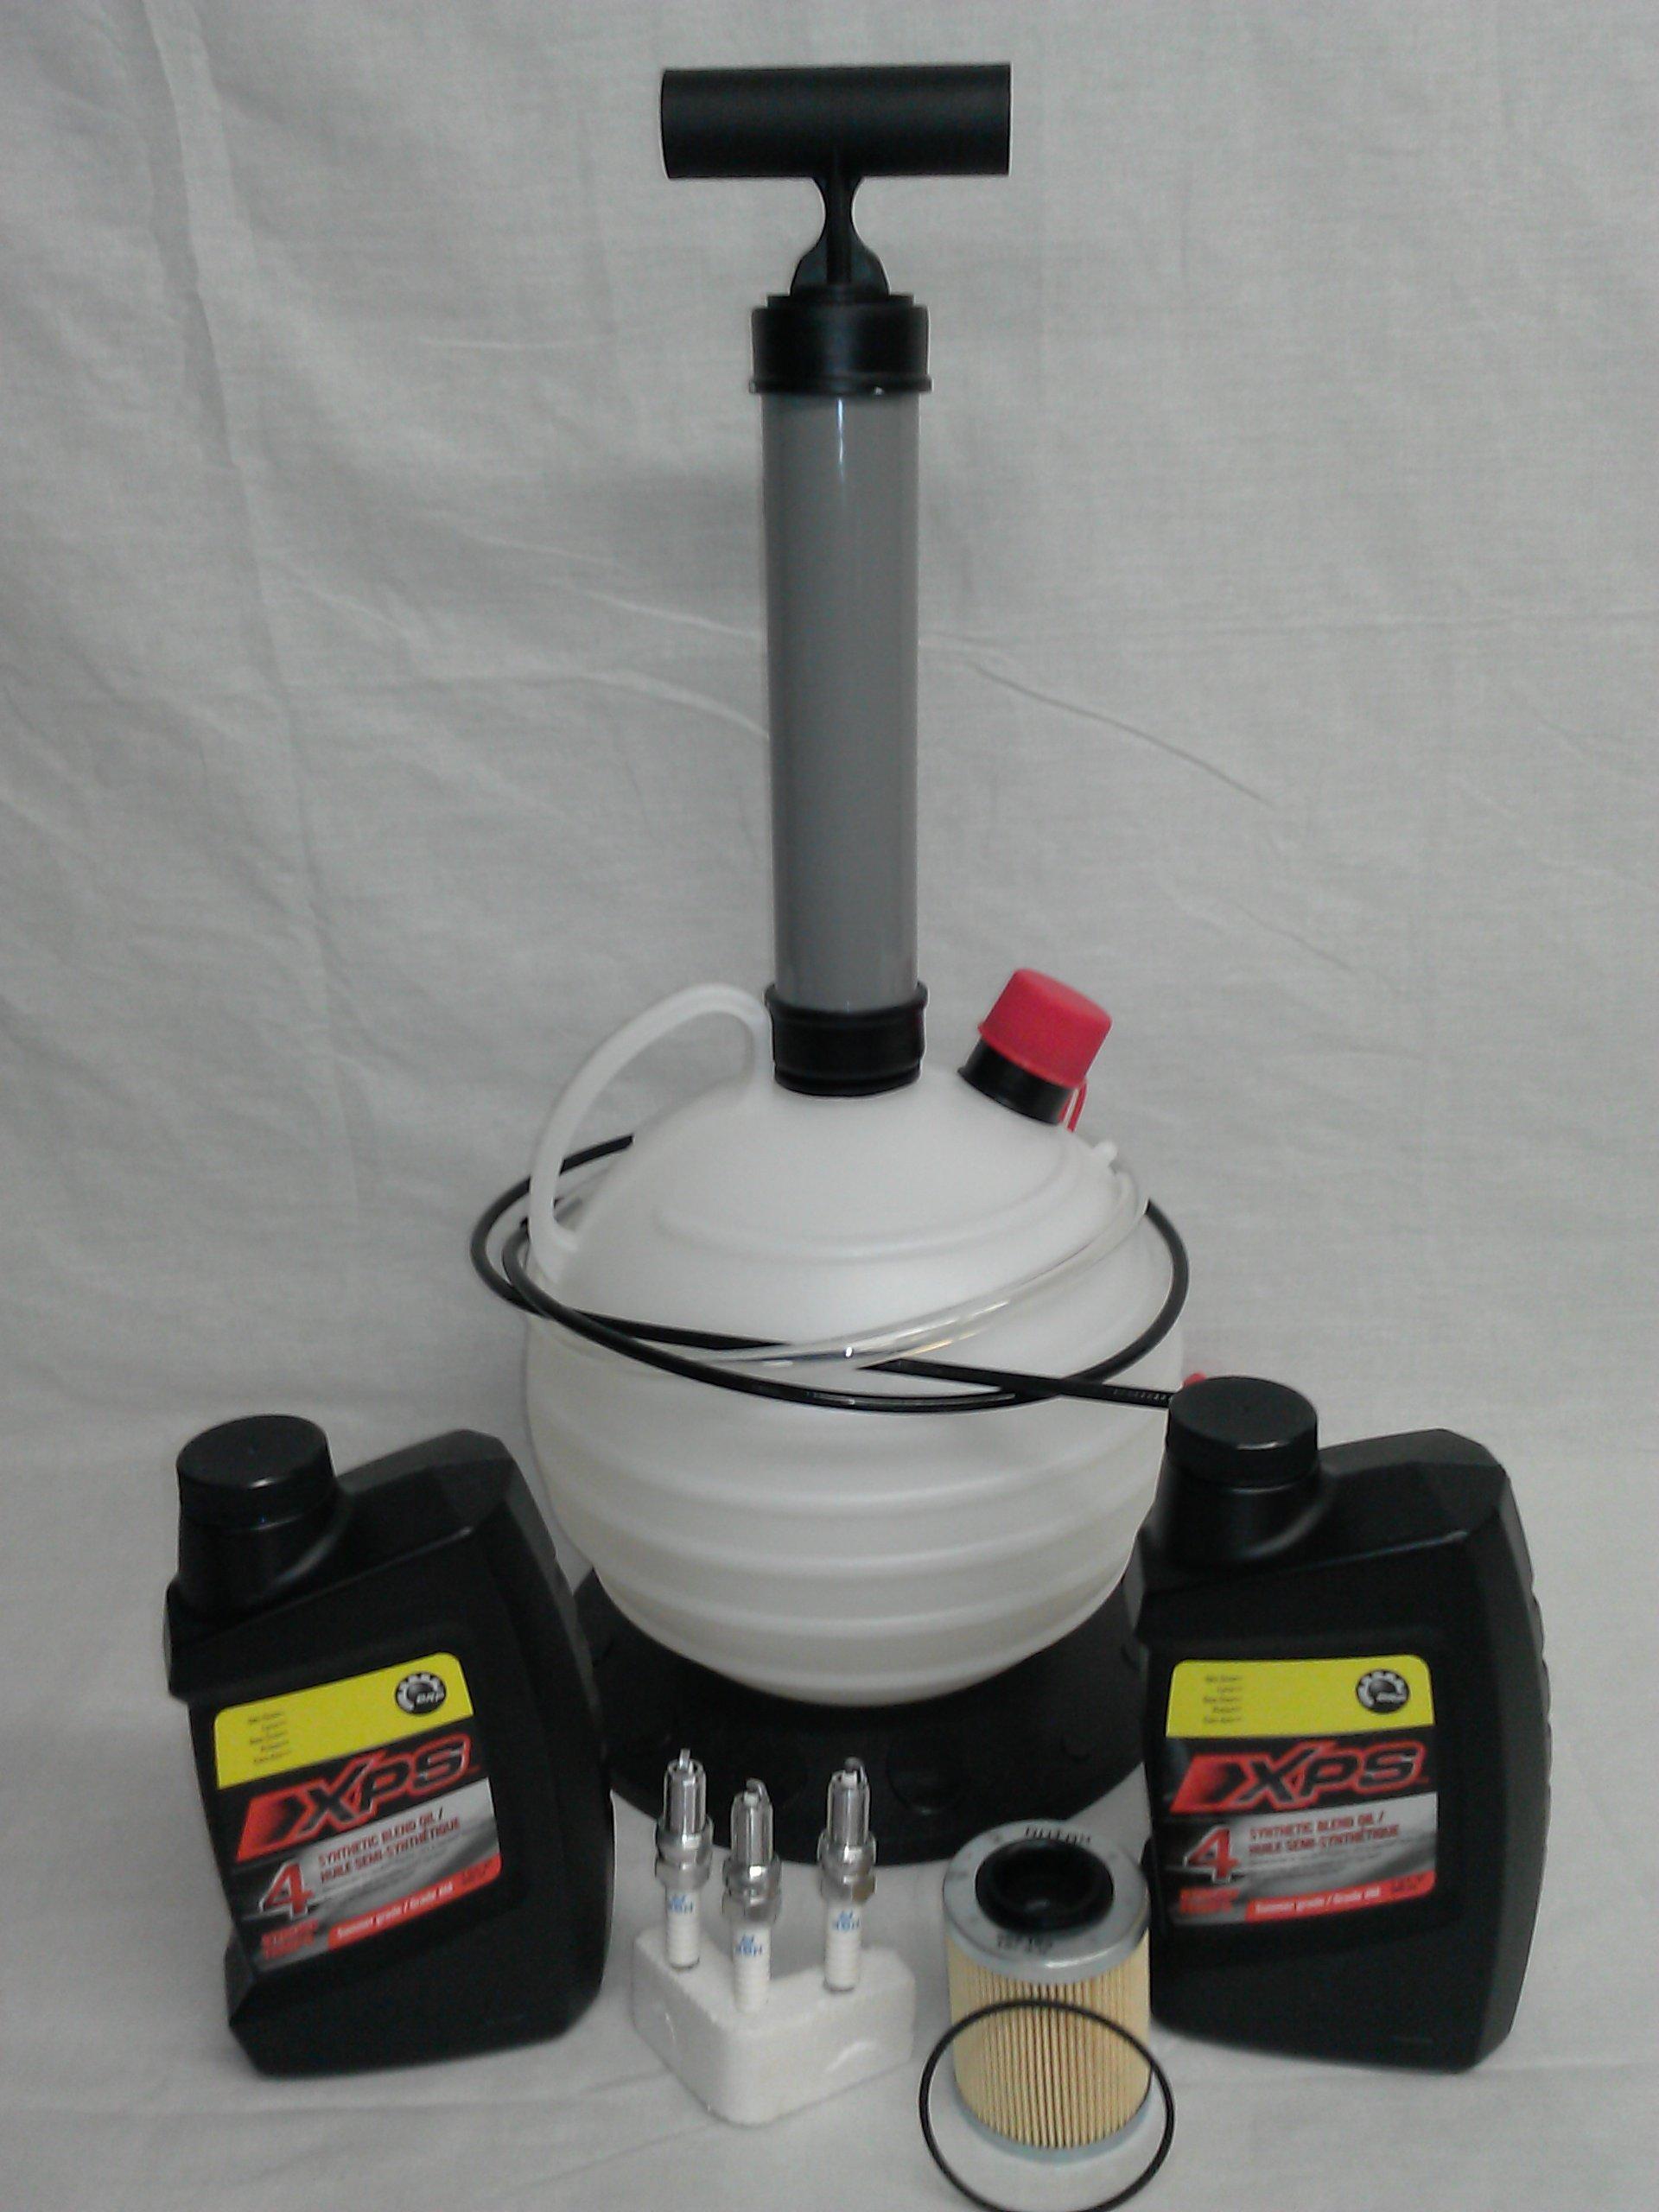 Sea-Doo SPARK Oil Change Kit Rotax 900 ACE SeaDoo Utlimate Oil Pump Extractor